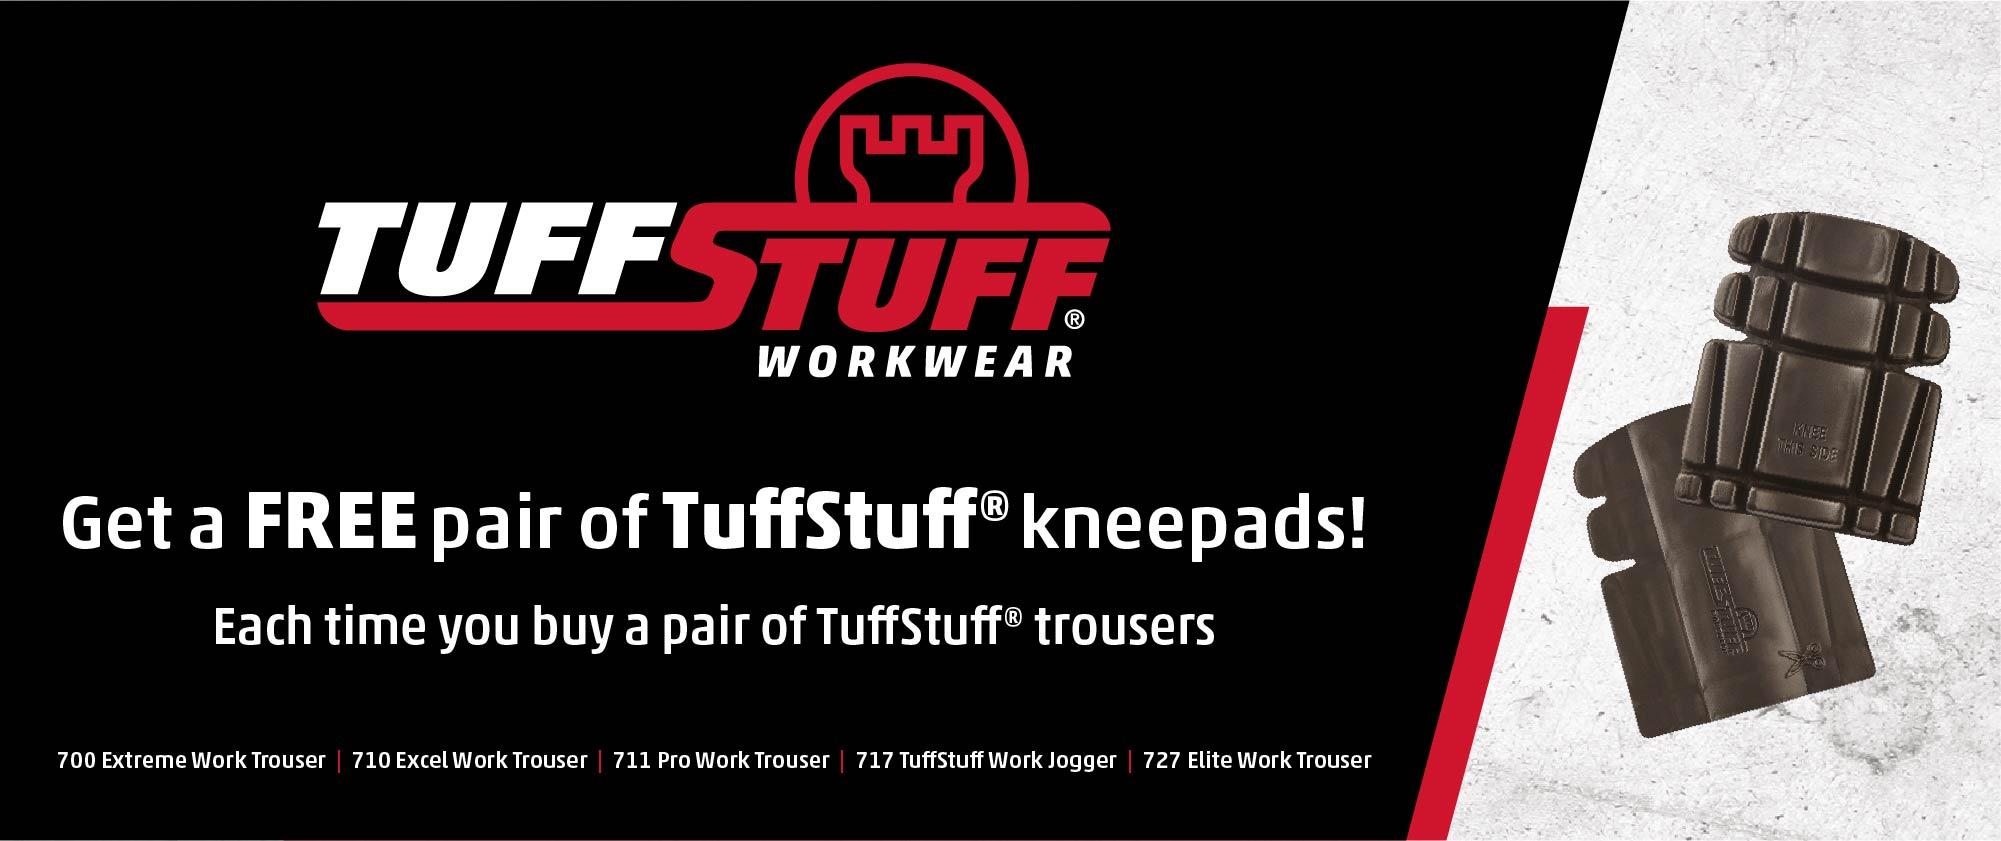 Tuff Stuff free kneepads